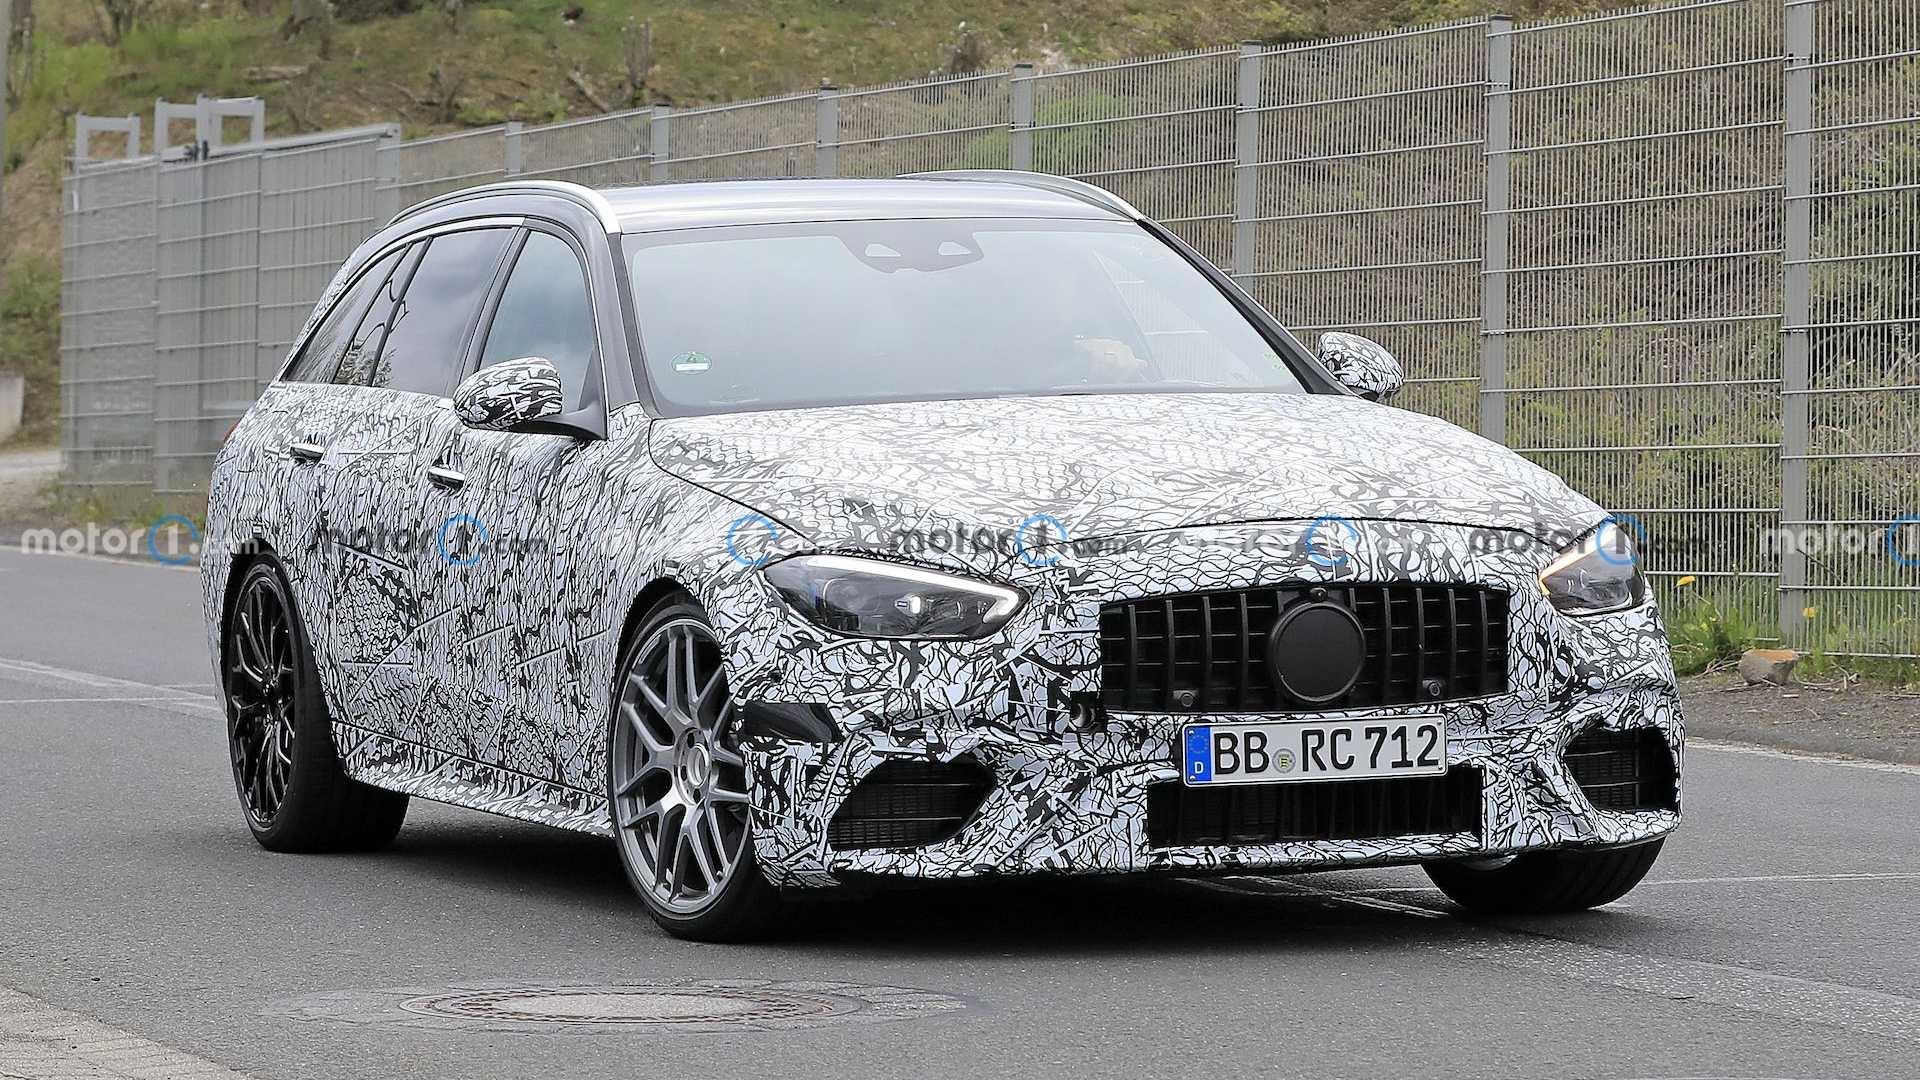 Nuova Mercedes-AMG C 63 Wagon prototipo Nurburgring